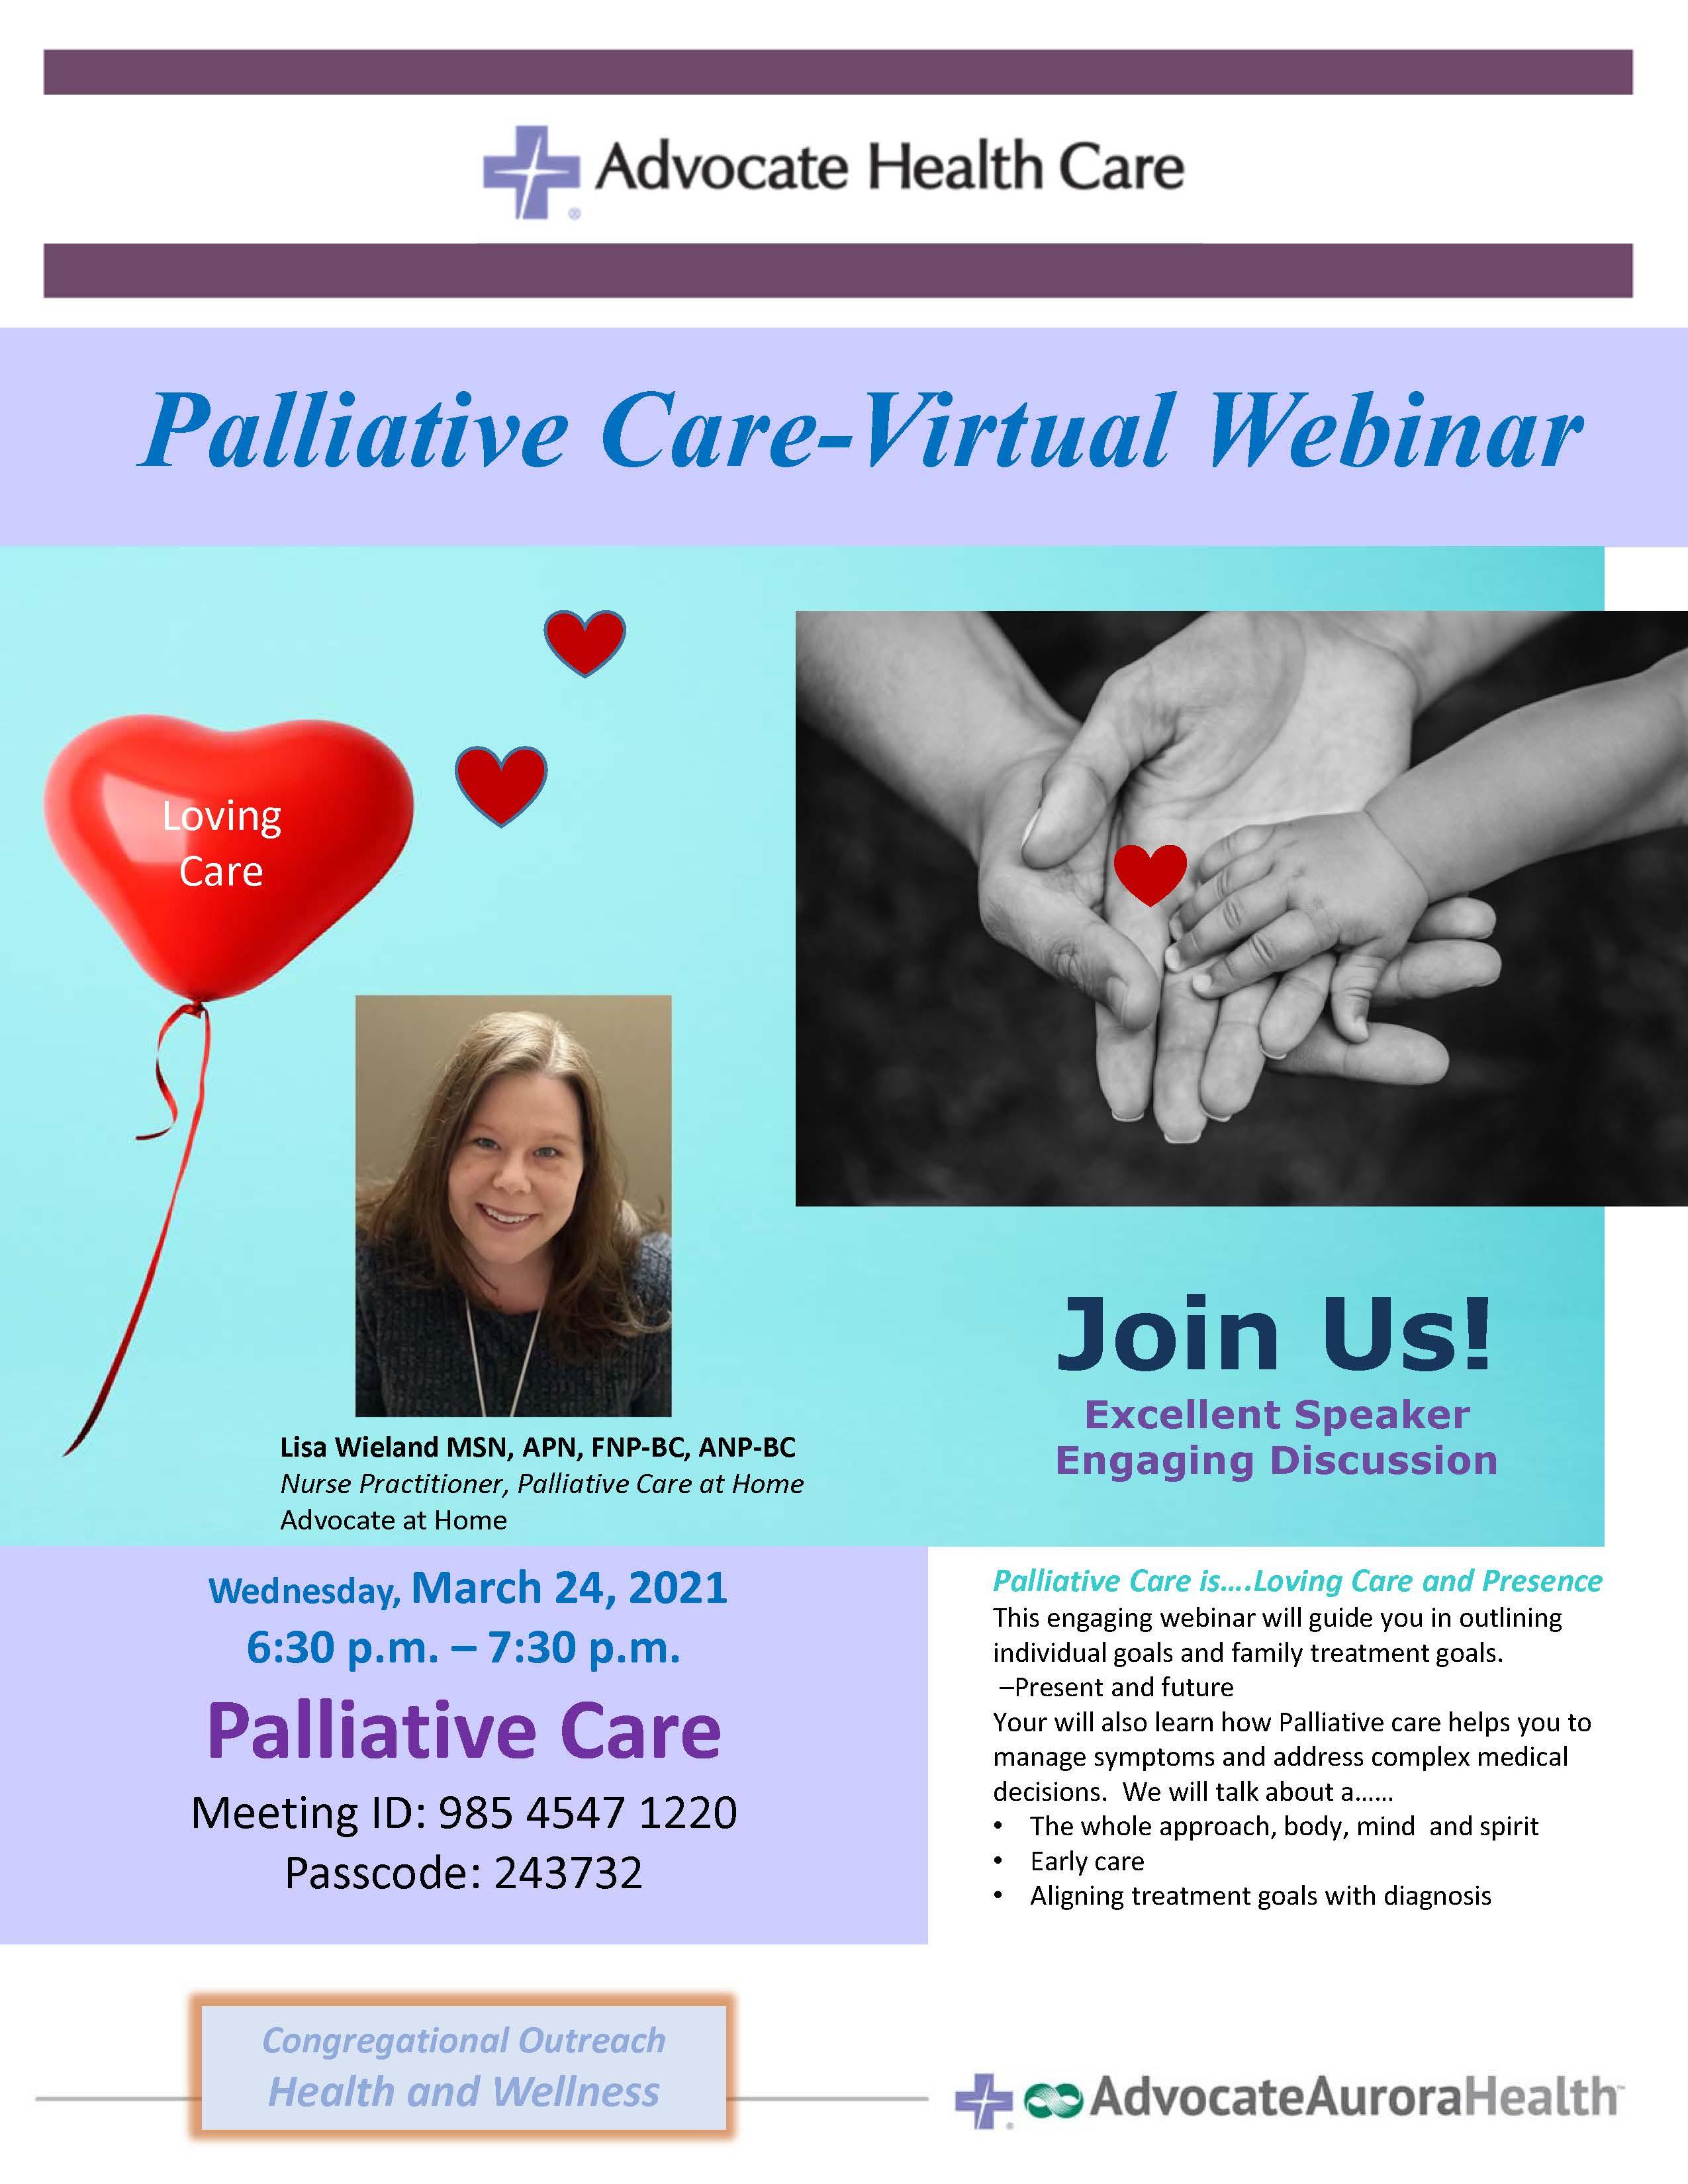 March 24 palliative care dysdlp